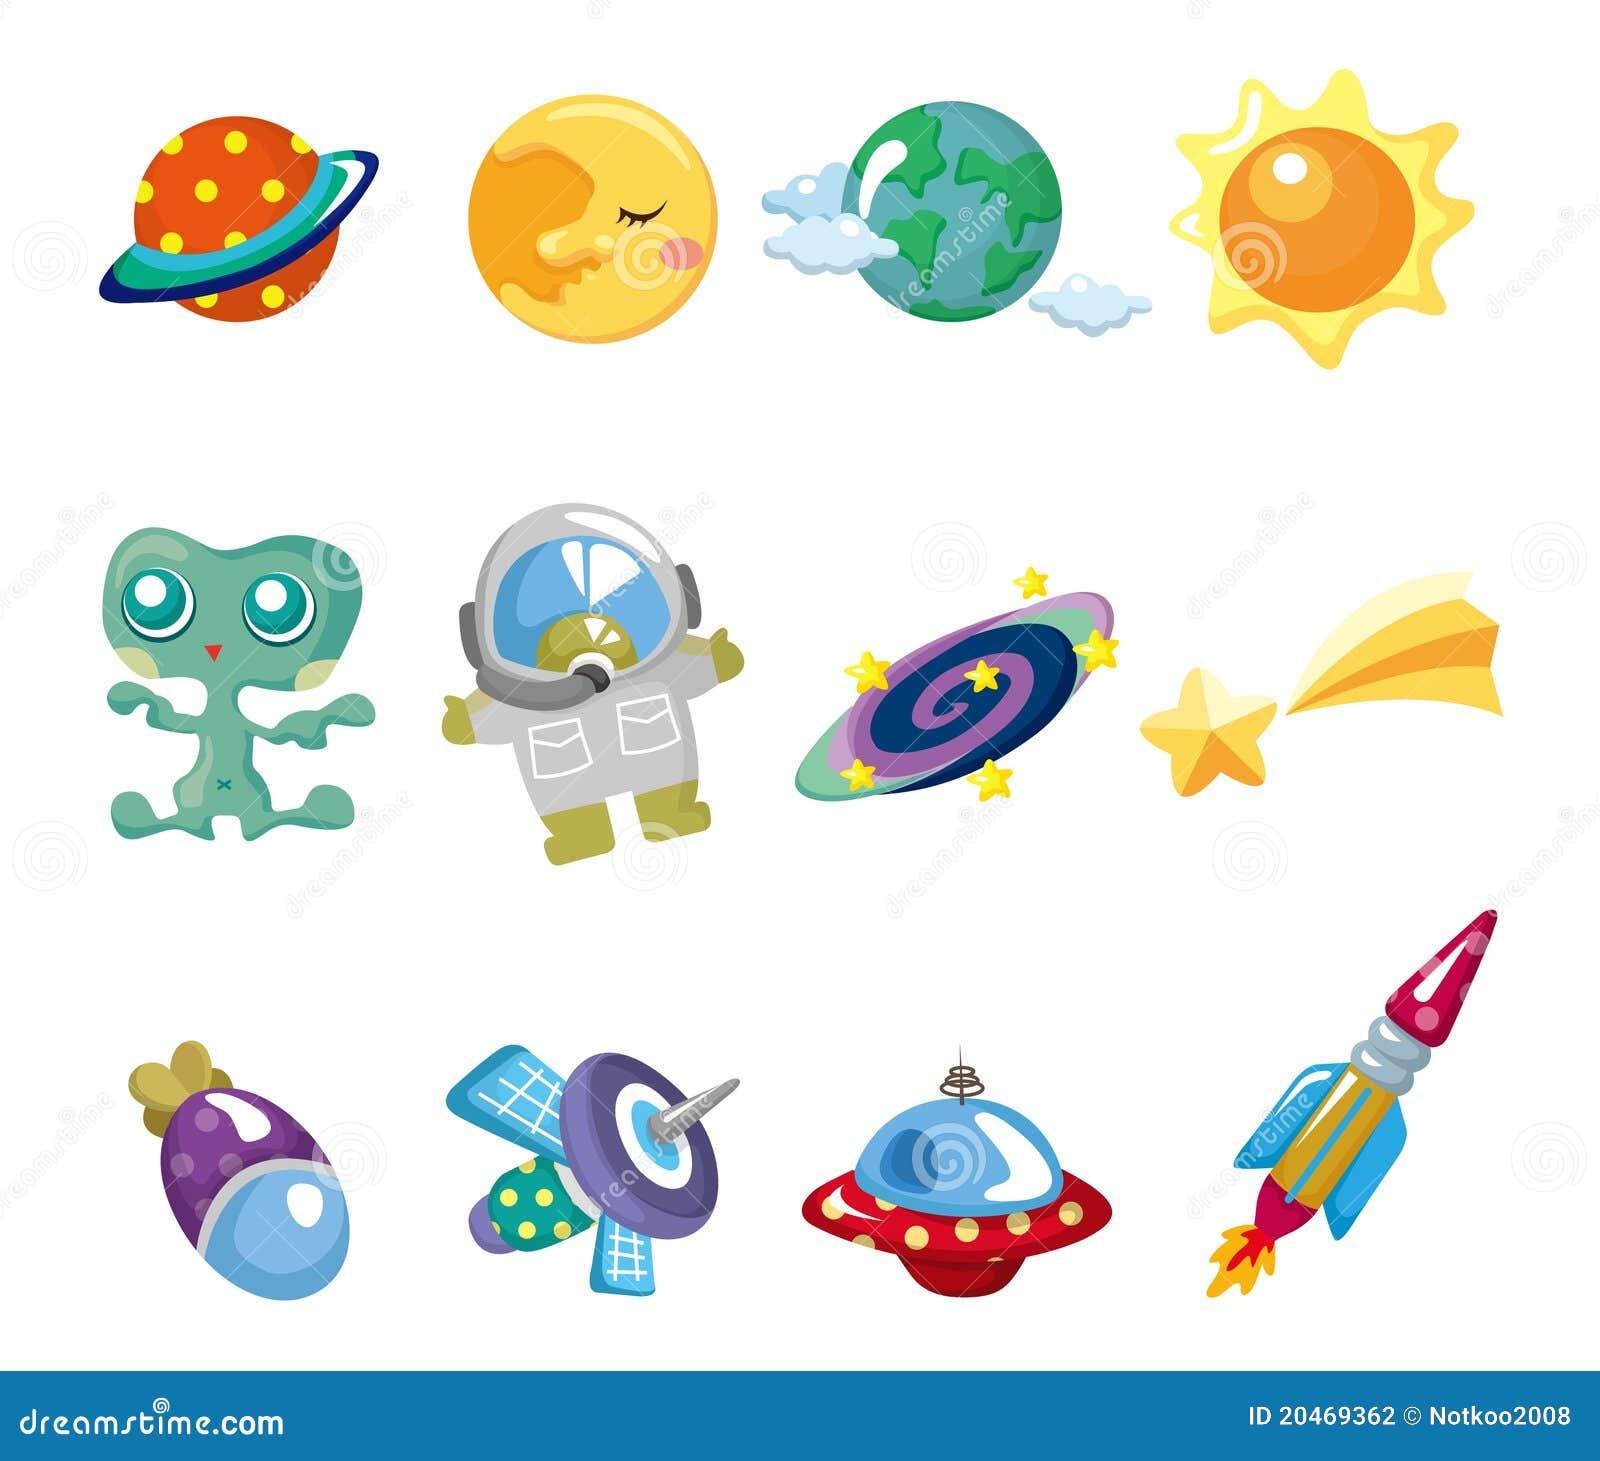 Cartoon space element icons set stock photography image - Dibujos infantiles del espacio ...